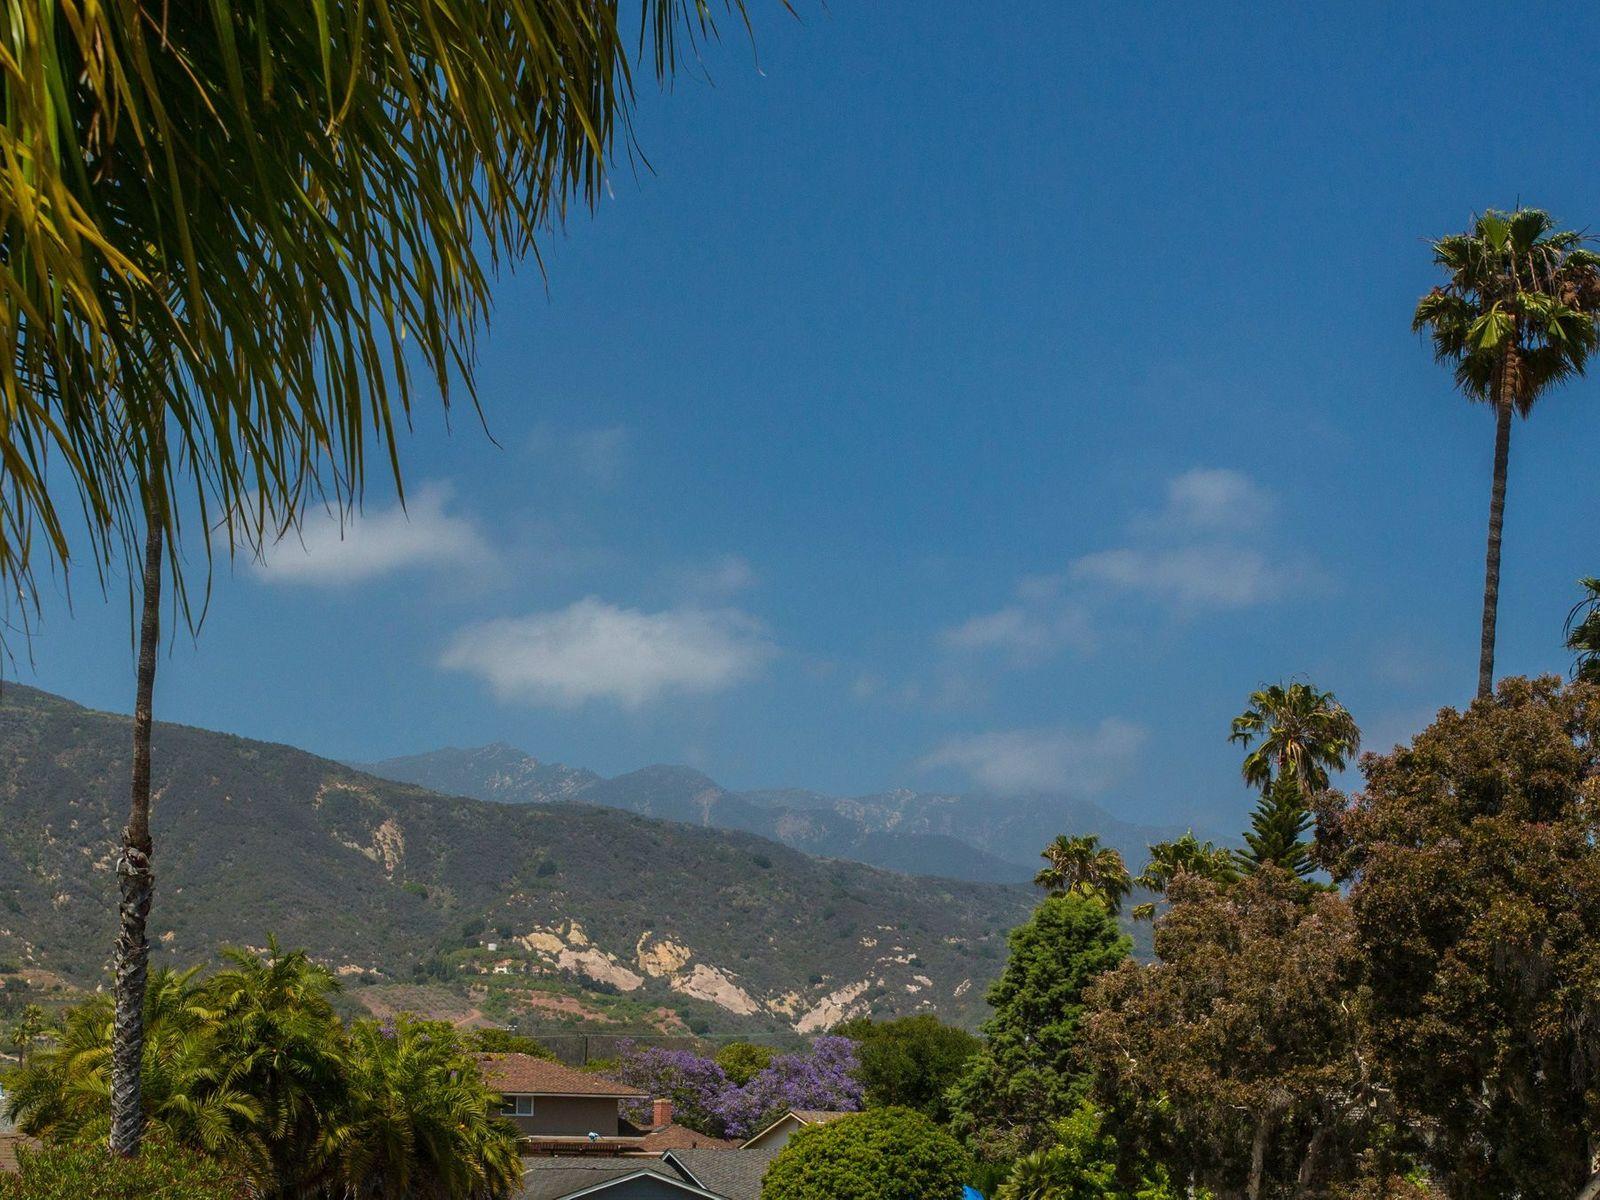 Spacious Home Embraces Mountain Views